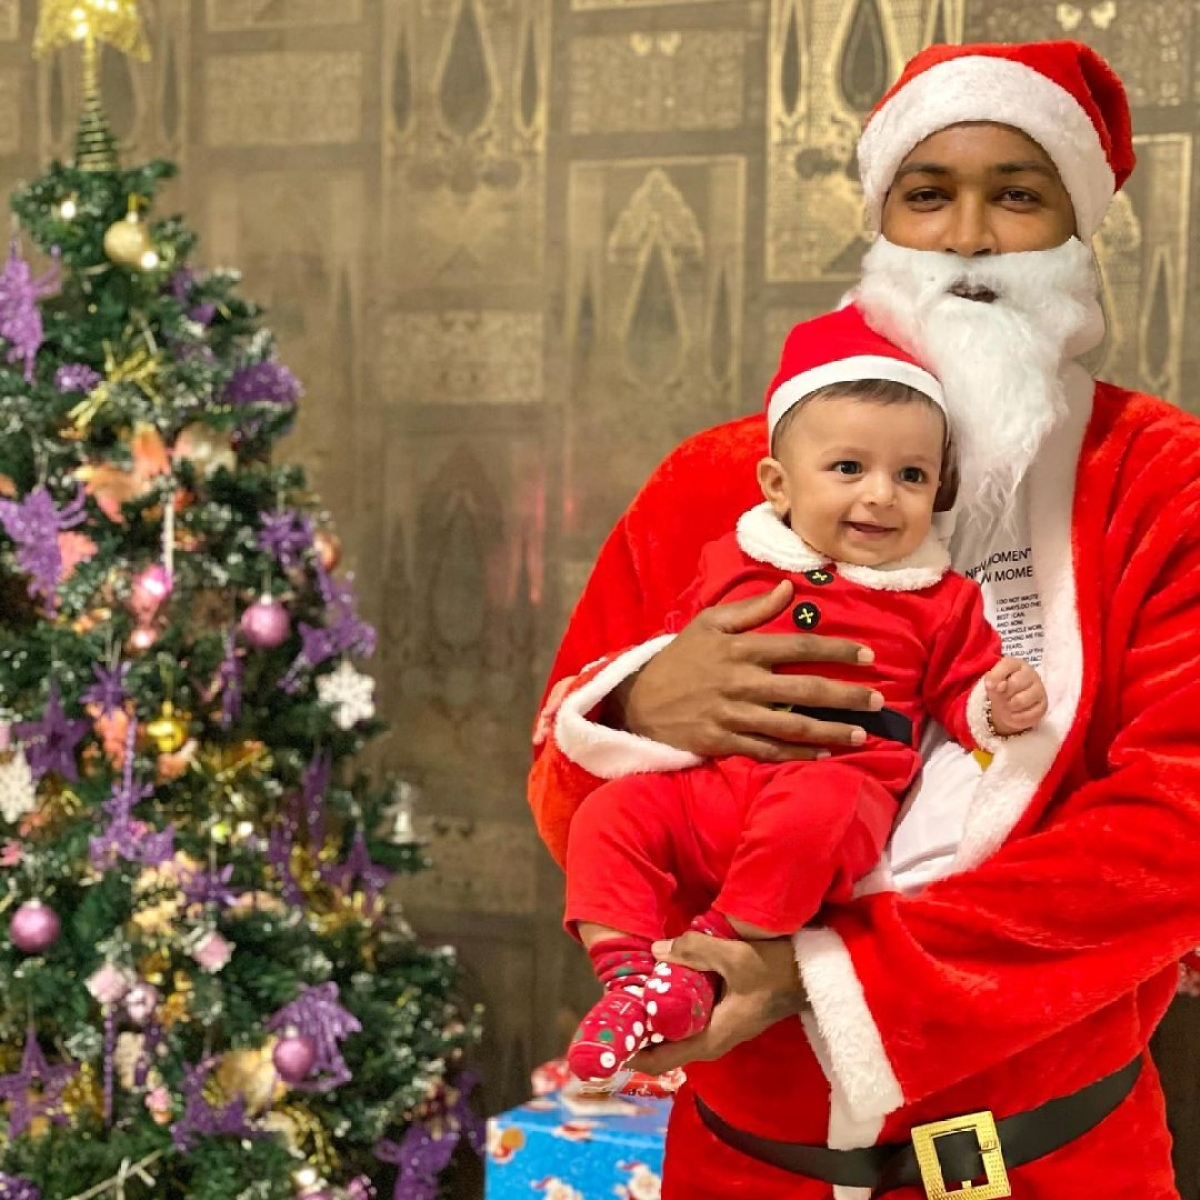 In Pics: Hardik Pandya turns Santa for baby boy Agastya's first Christmas